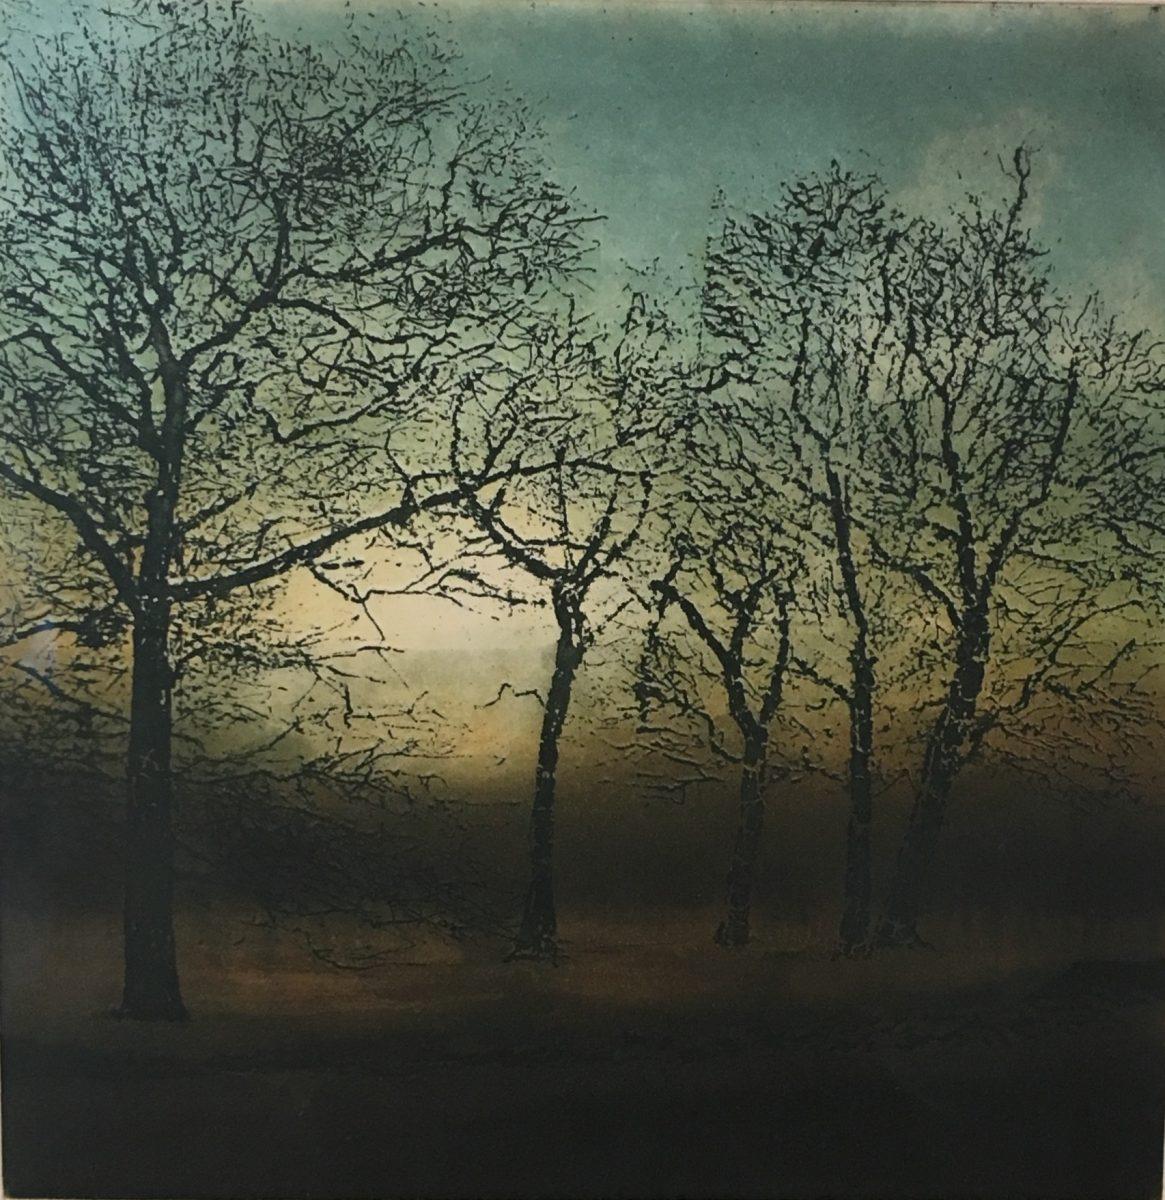 Morning Walk, Robert Russel